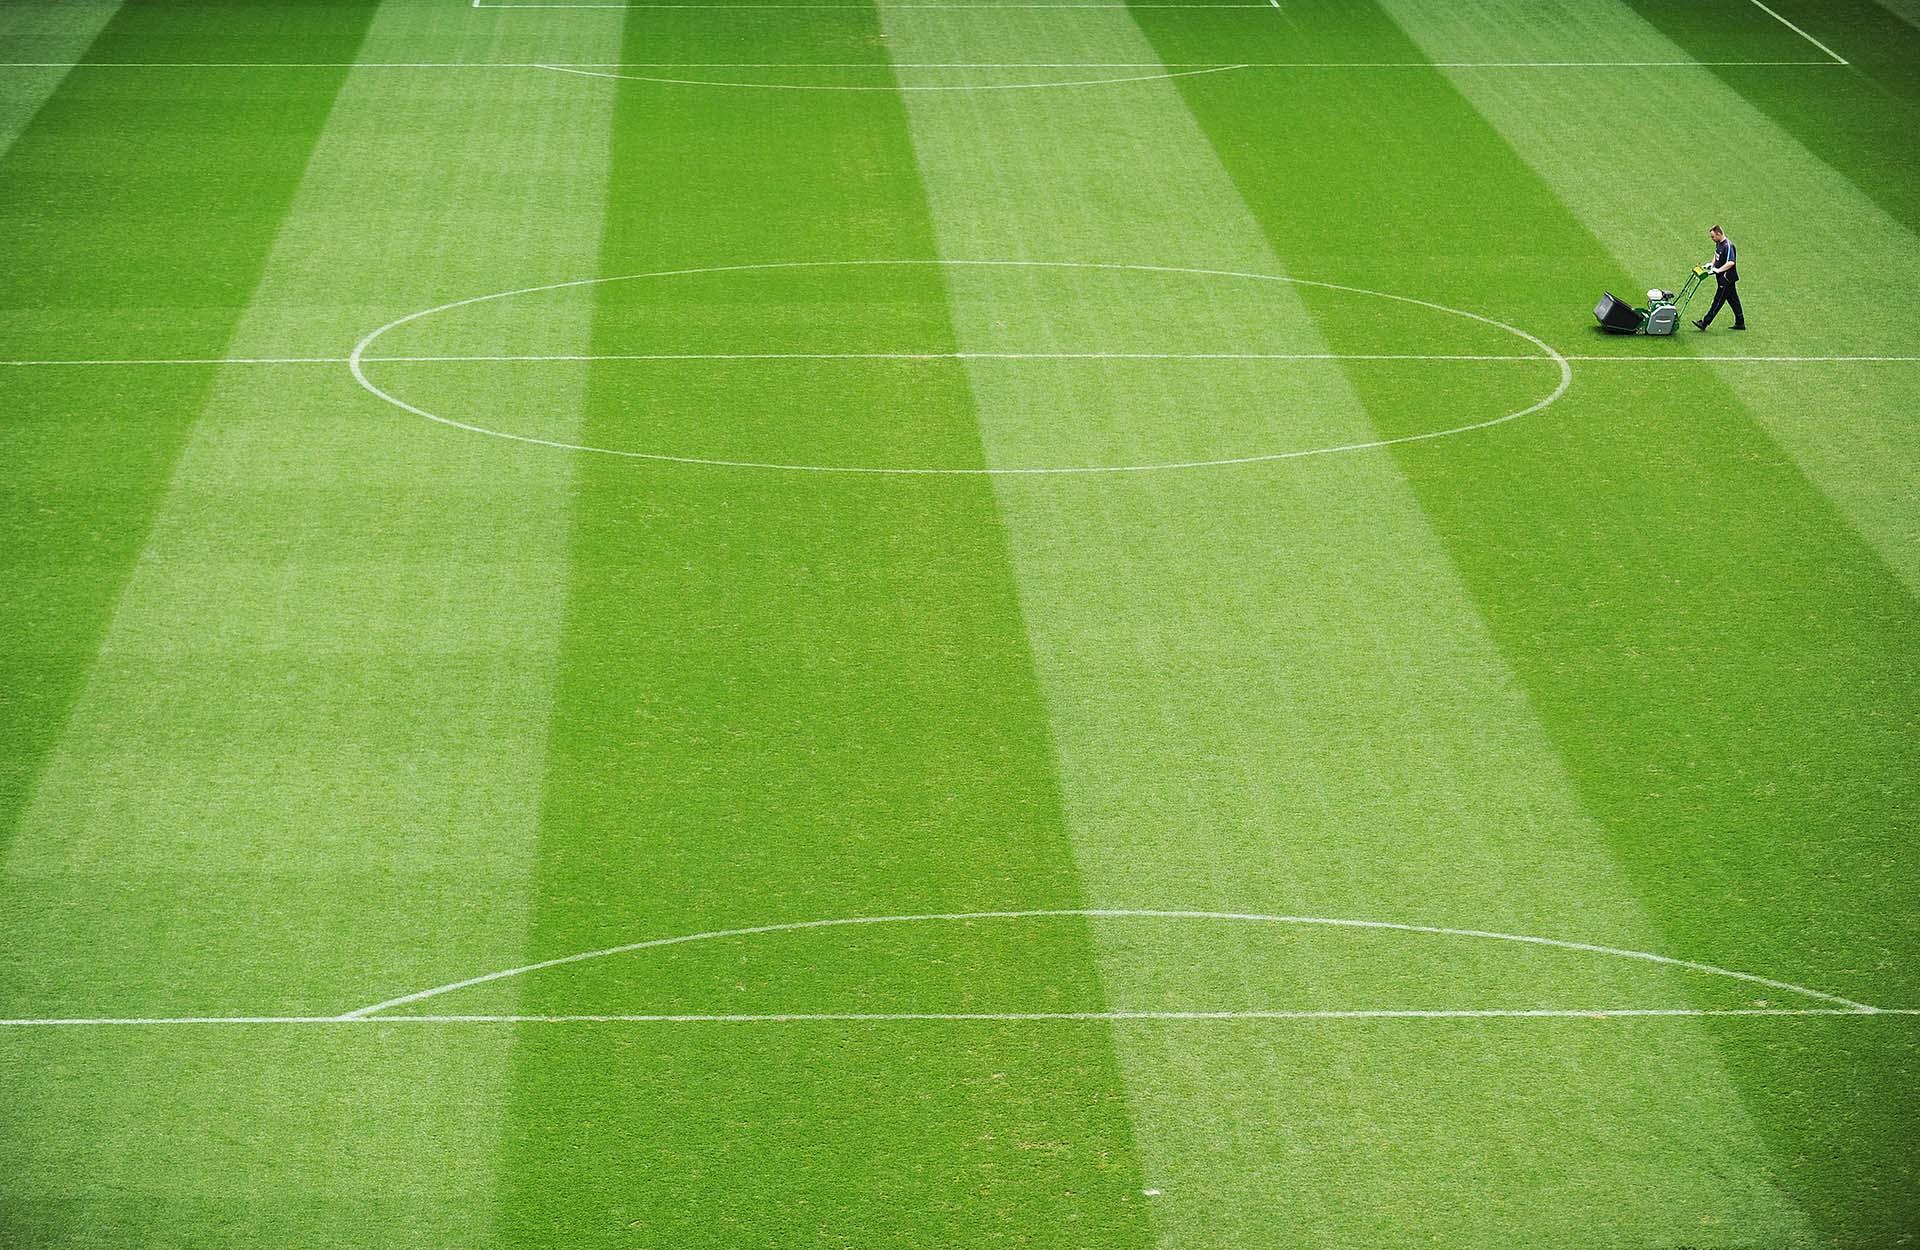 Photograph of Manchester City Etihad stadium pitch, Photographer Jon Parker Lee